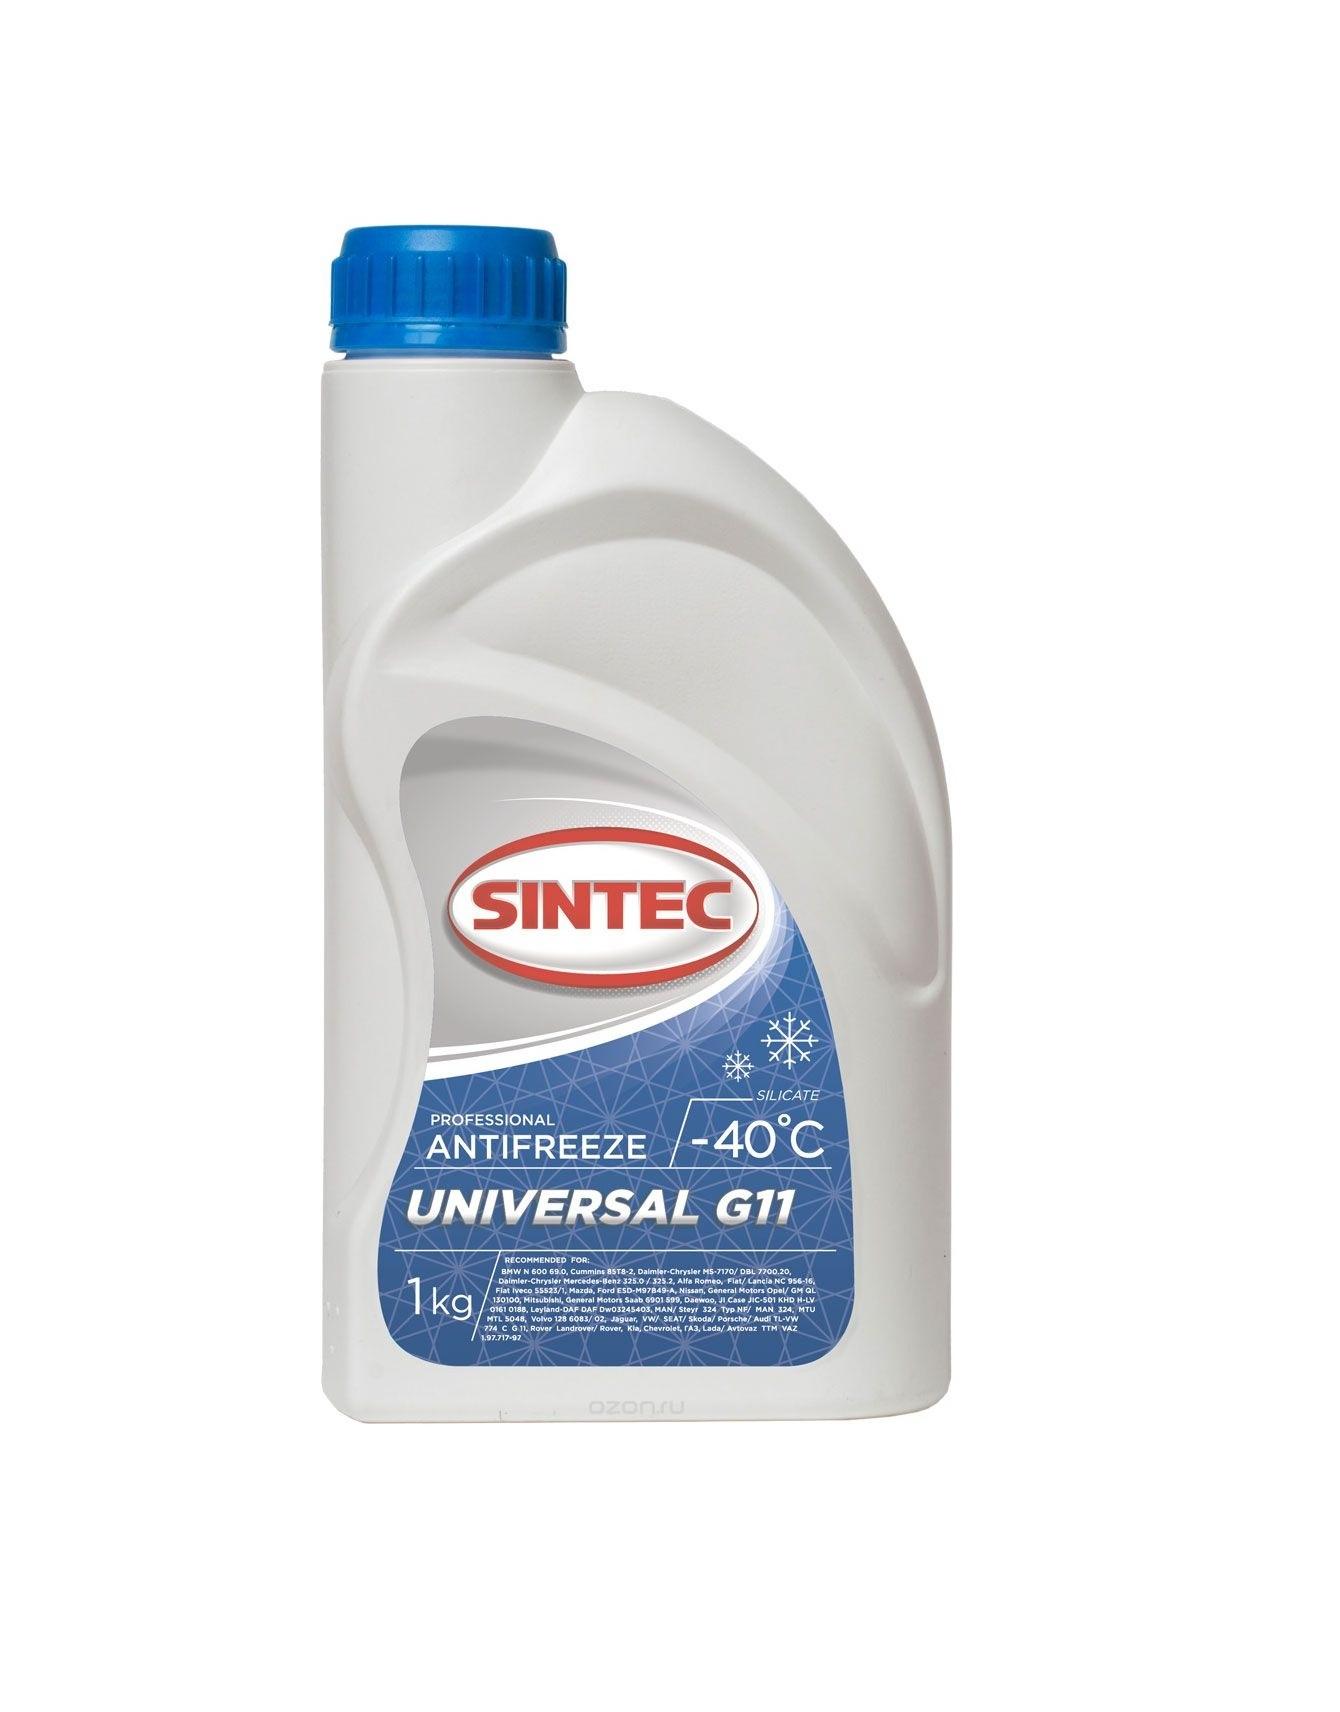 Sintec ANTIFREEZE UNIVERSAL G11 концентрат (1 кг)